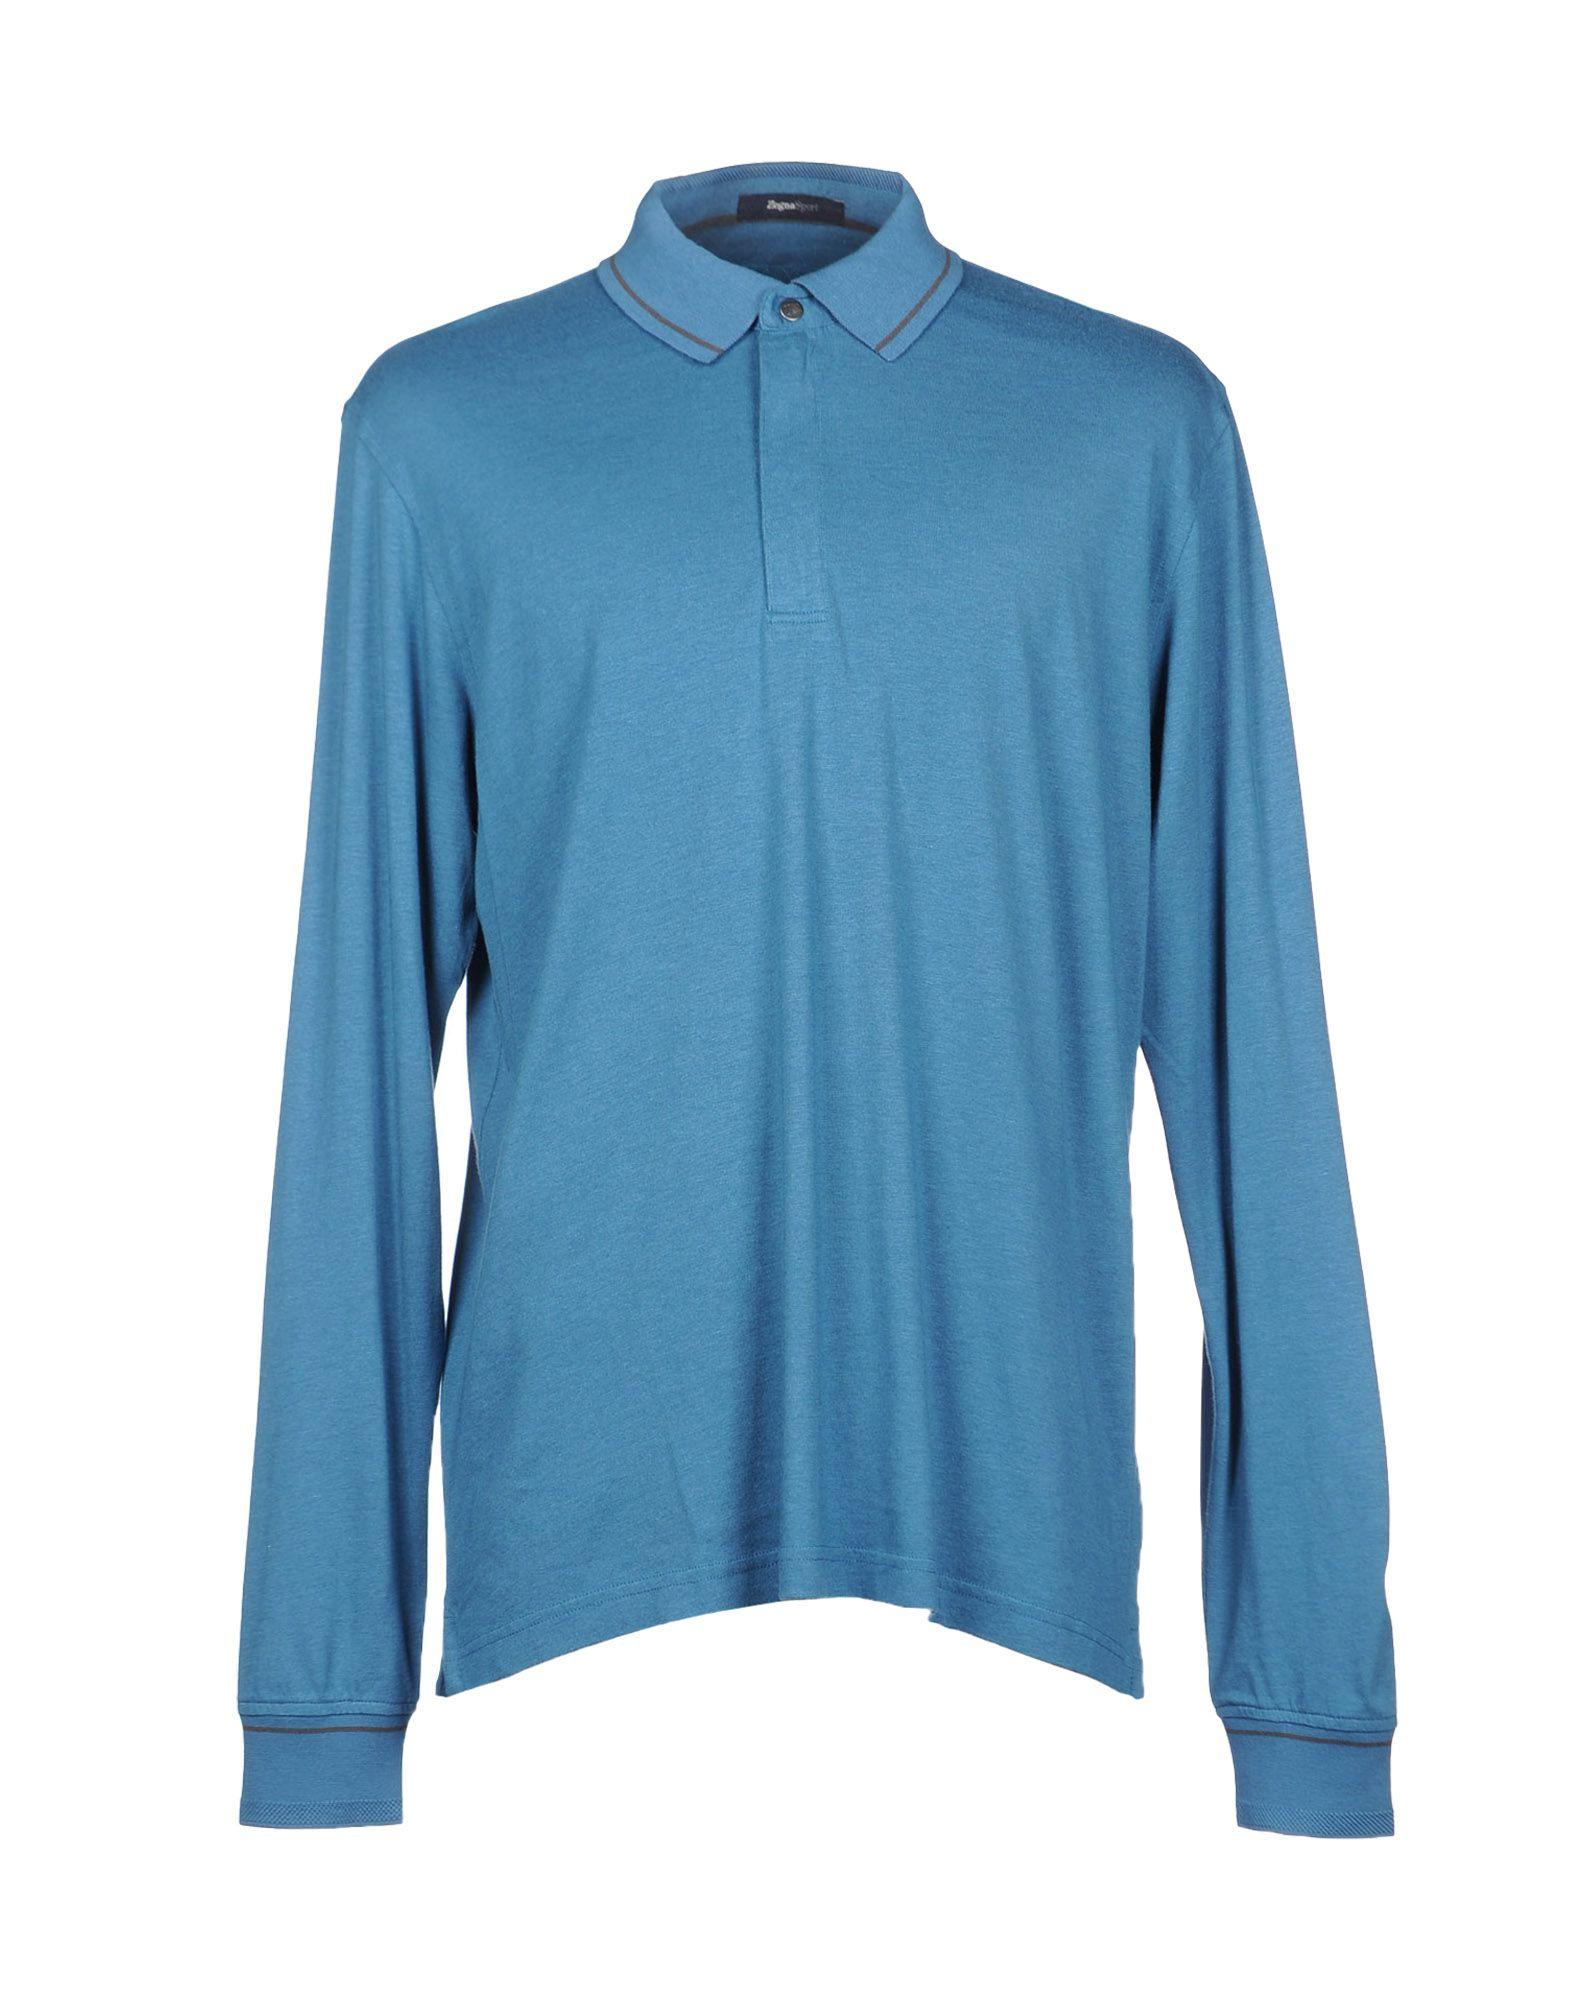 Zegna sport polo shirt in blue for men pastel blue for Zegna polo shirts sale